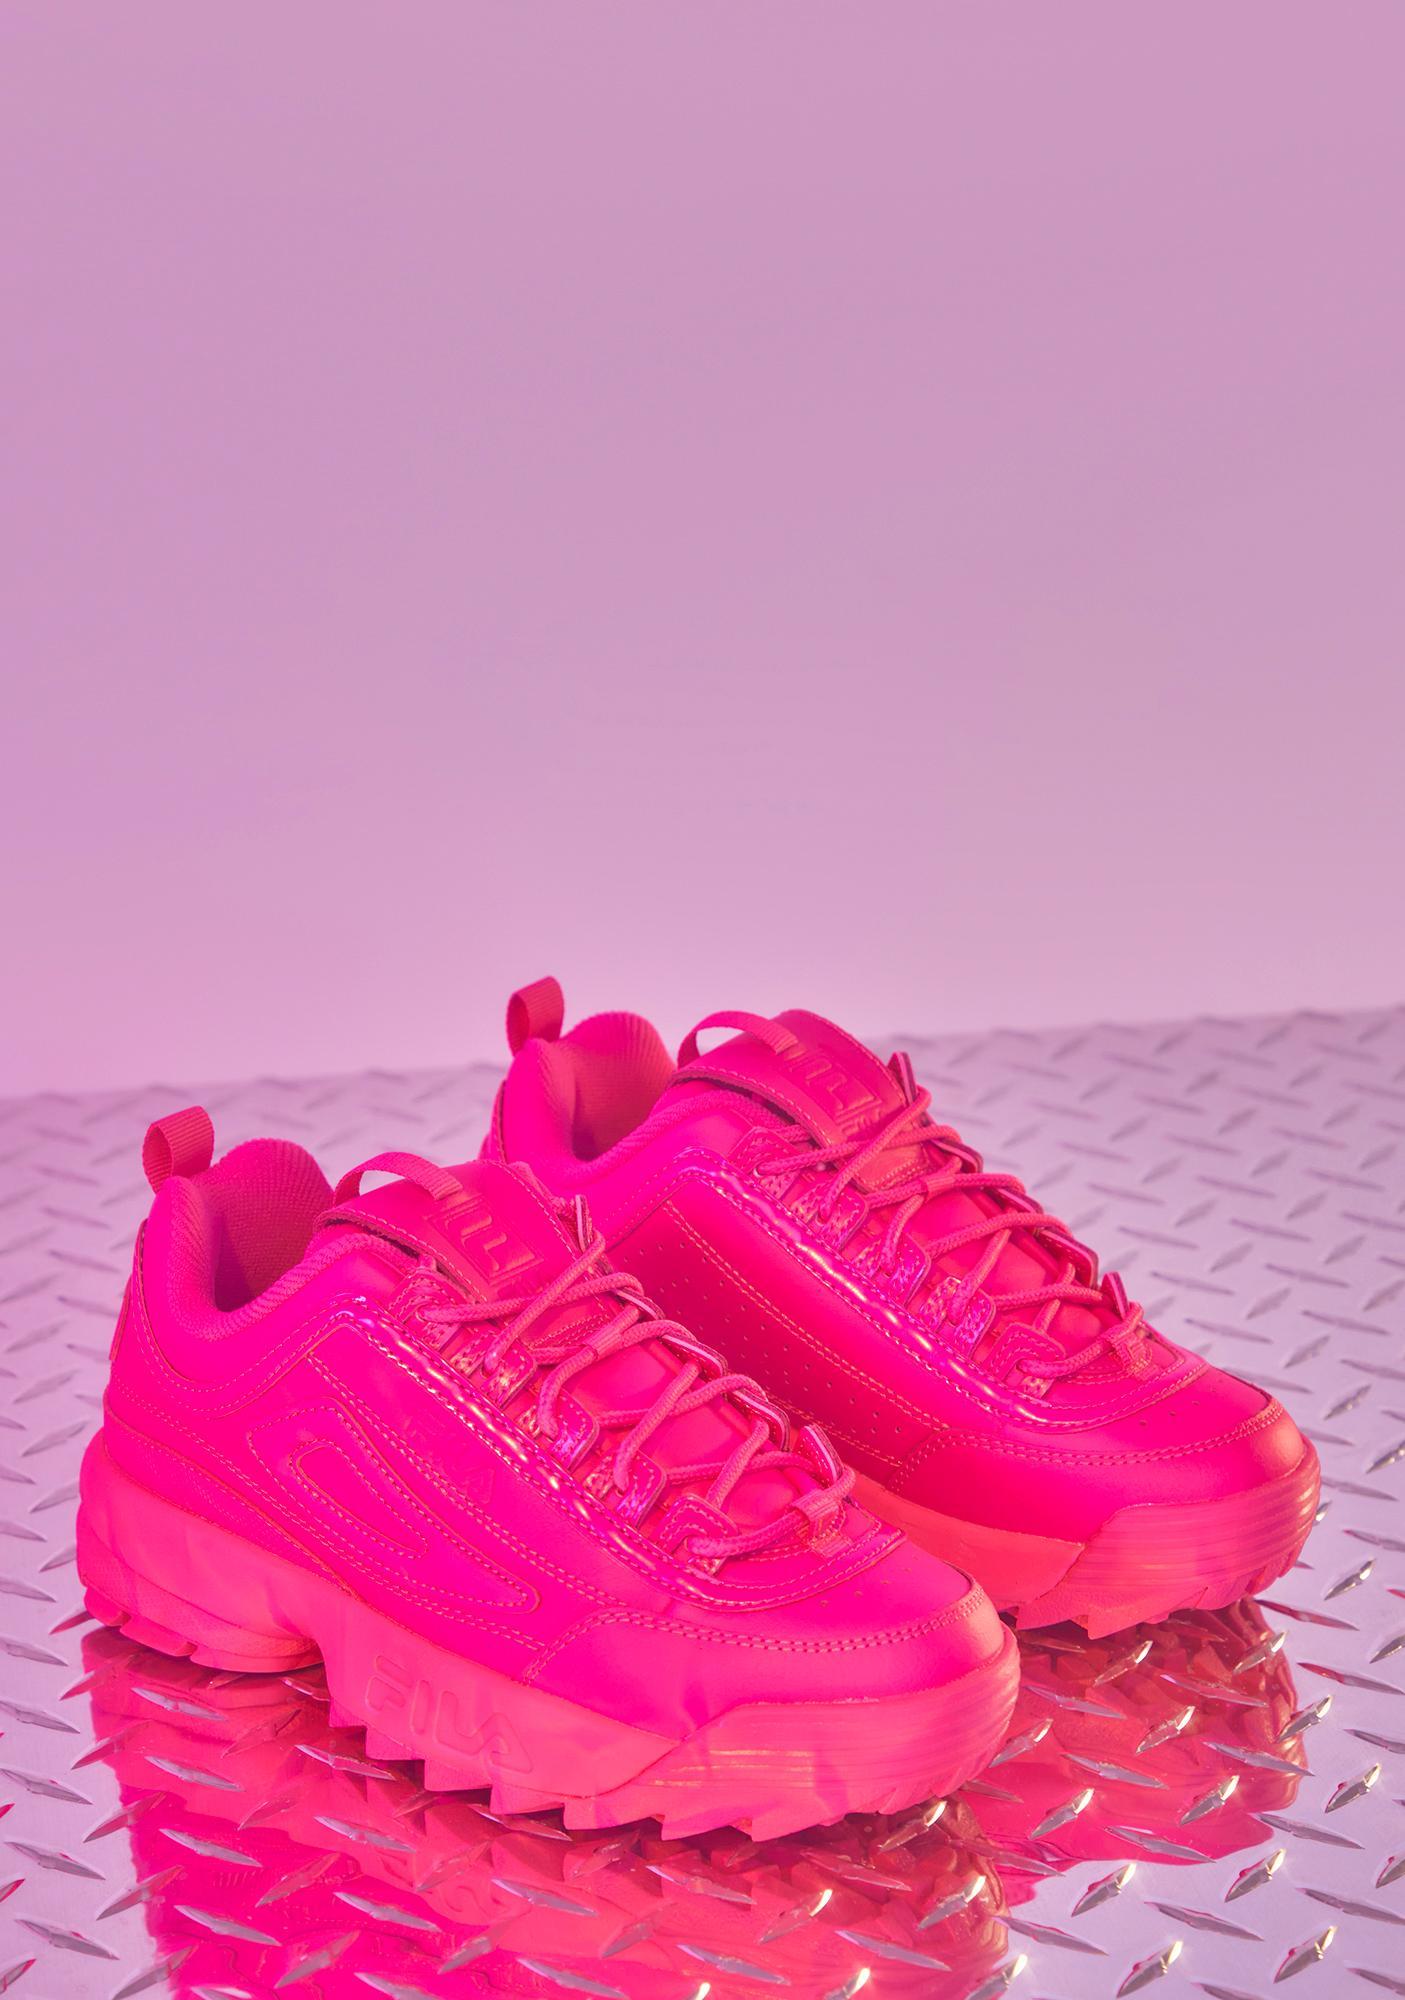 Fila Pink Glo Solid Disruptor 2 Premiums